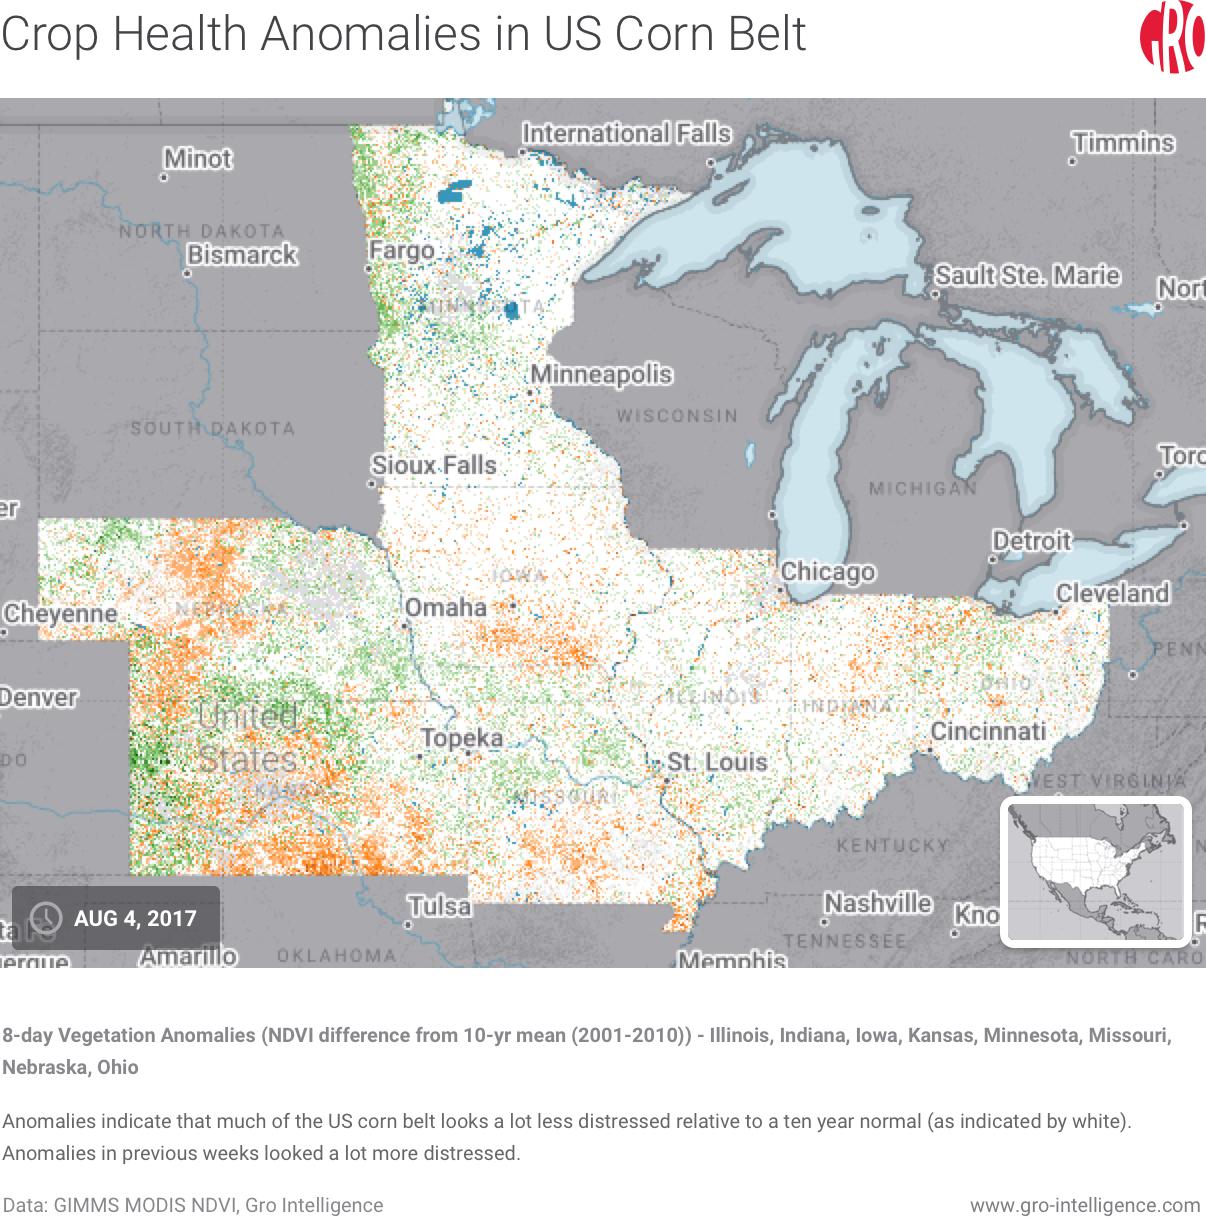 Crop Health Anomalies in US Corn Belt